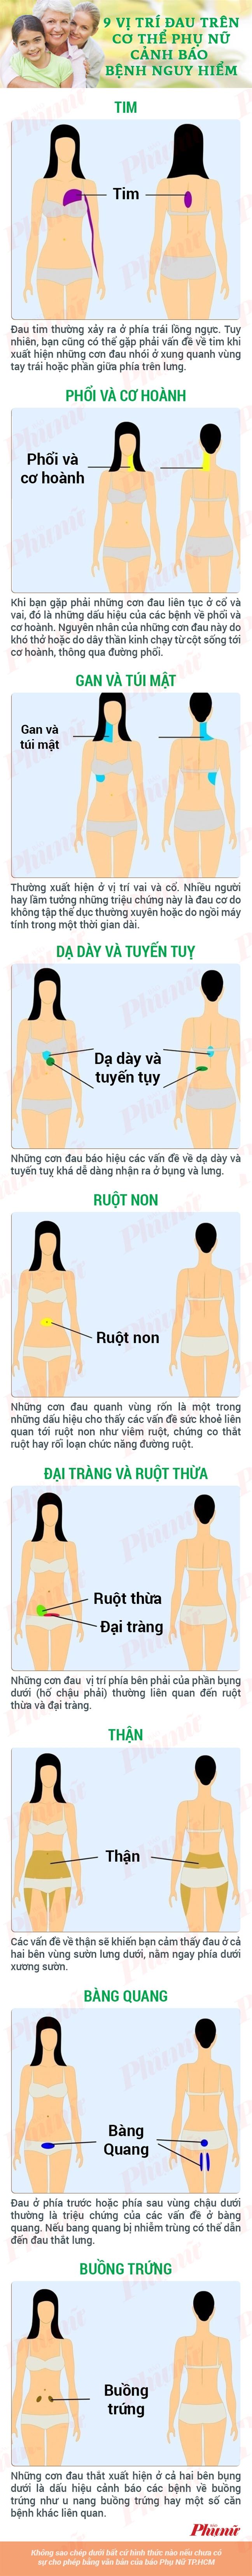 9 vi tri dau tren co the phu nu canh bao benh nguy hiem